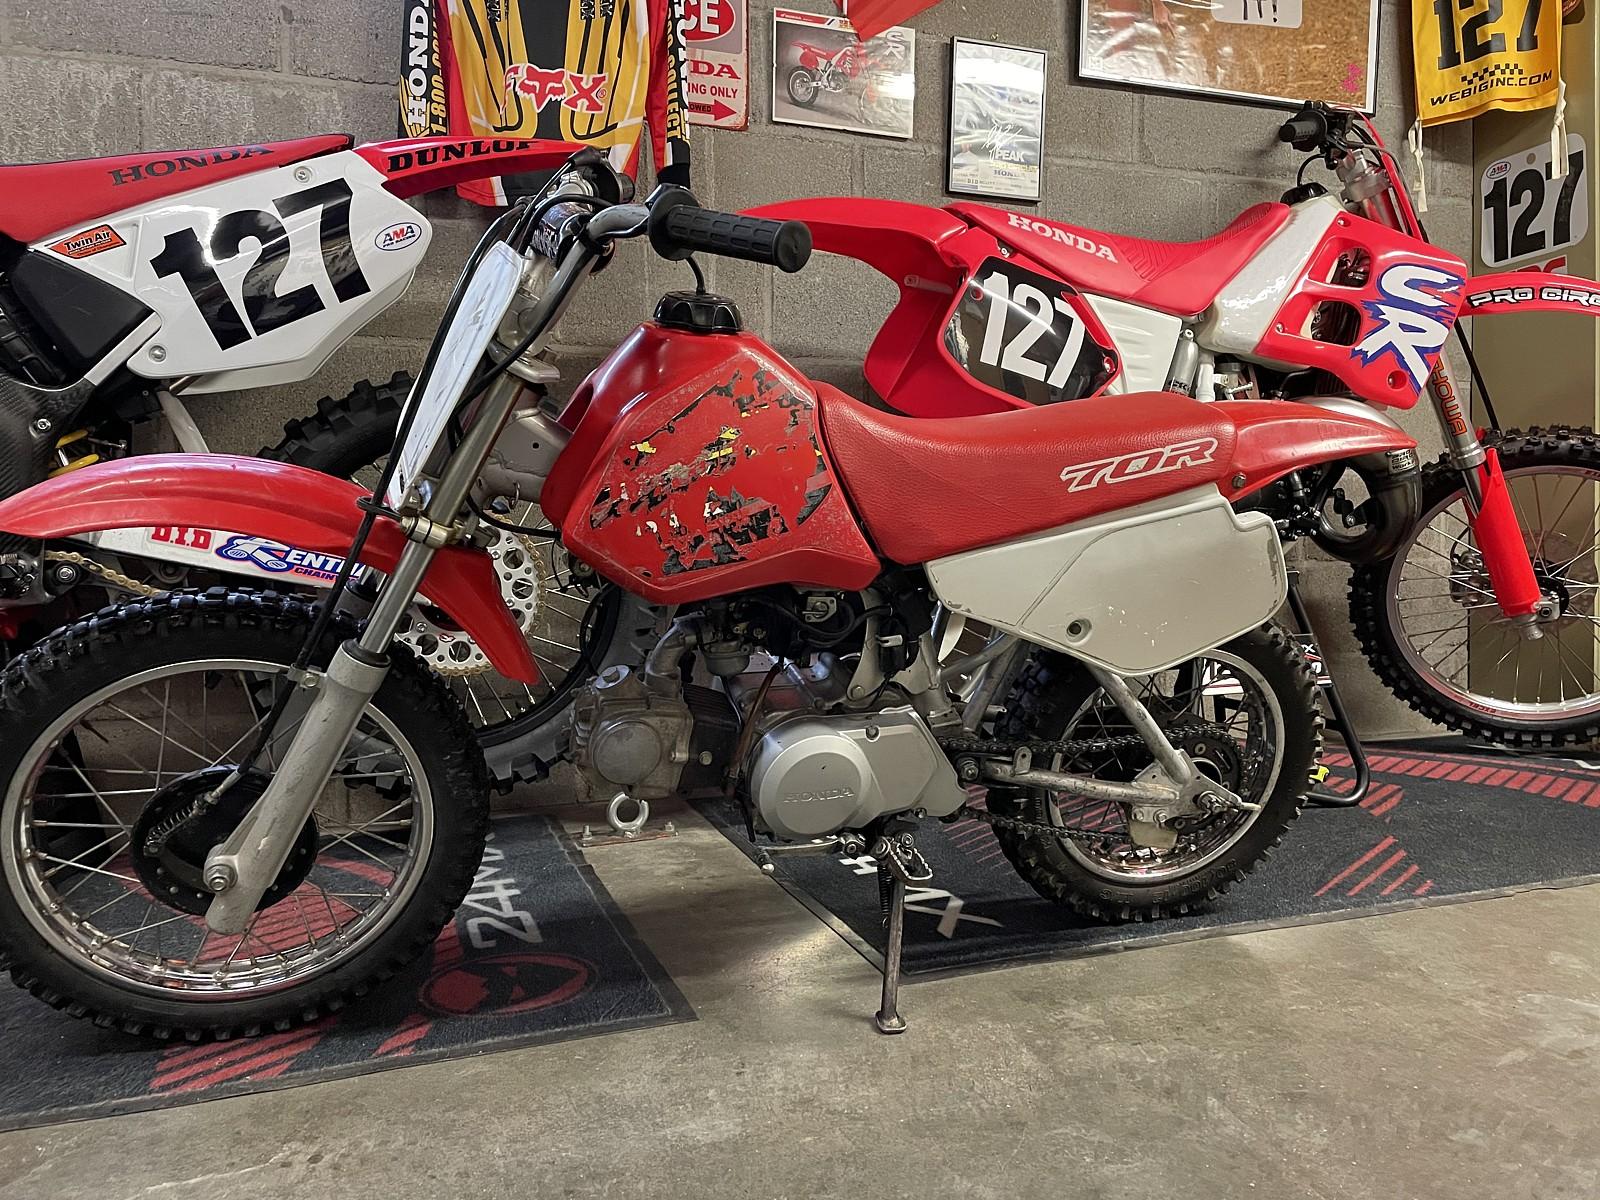 B9D95262-8F25-4089-ADA5-70C26041C2A0 - Godcho - Motocross Pictures - Vital MX